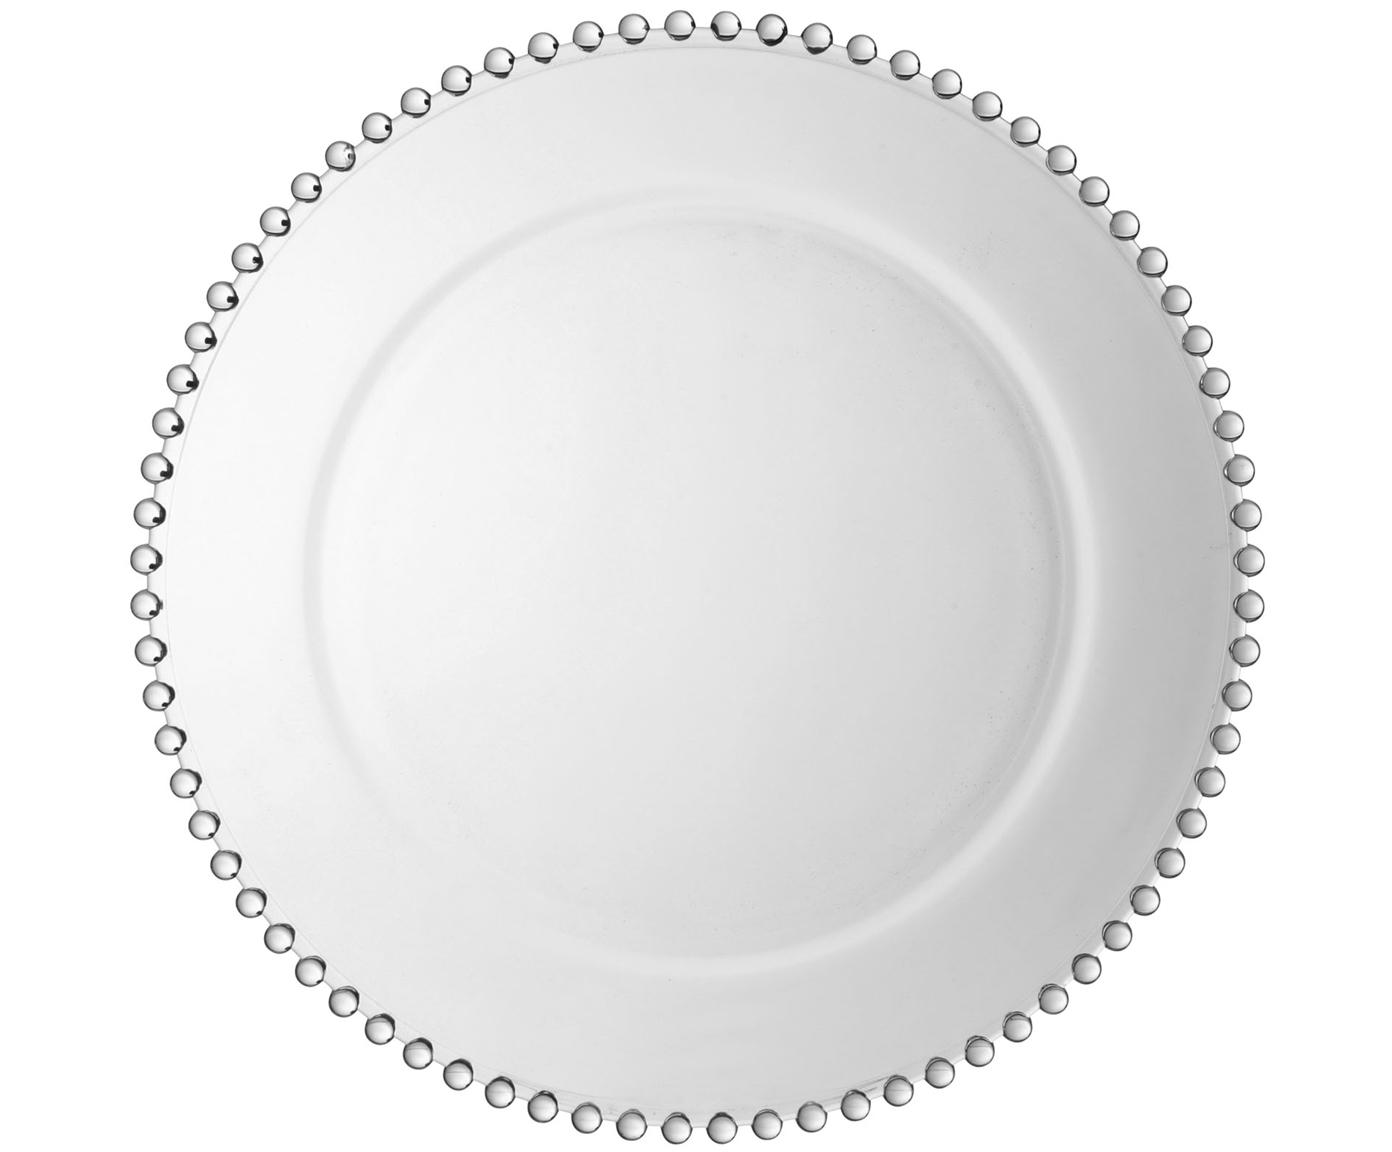 Bajoplato Perles, Vidrio, Transparente, Ø 33 cm